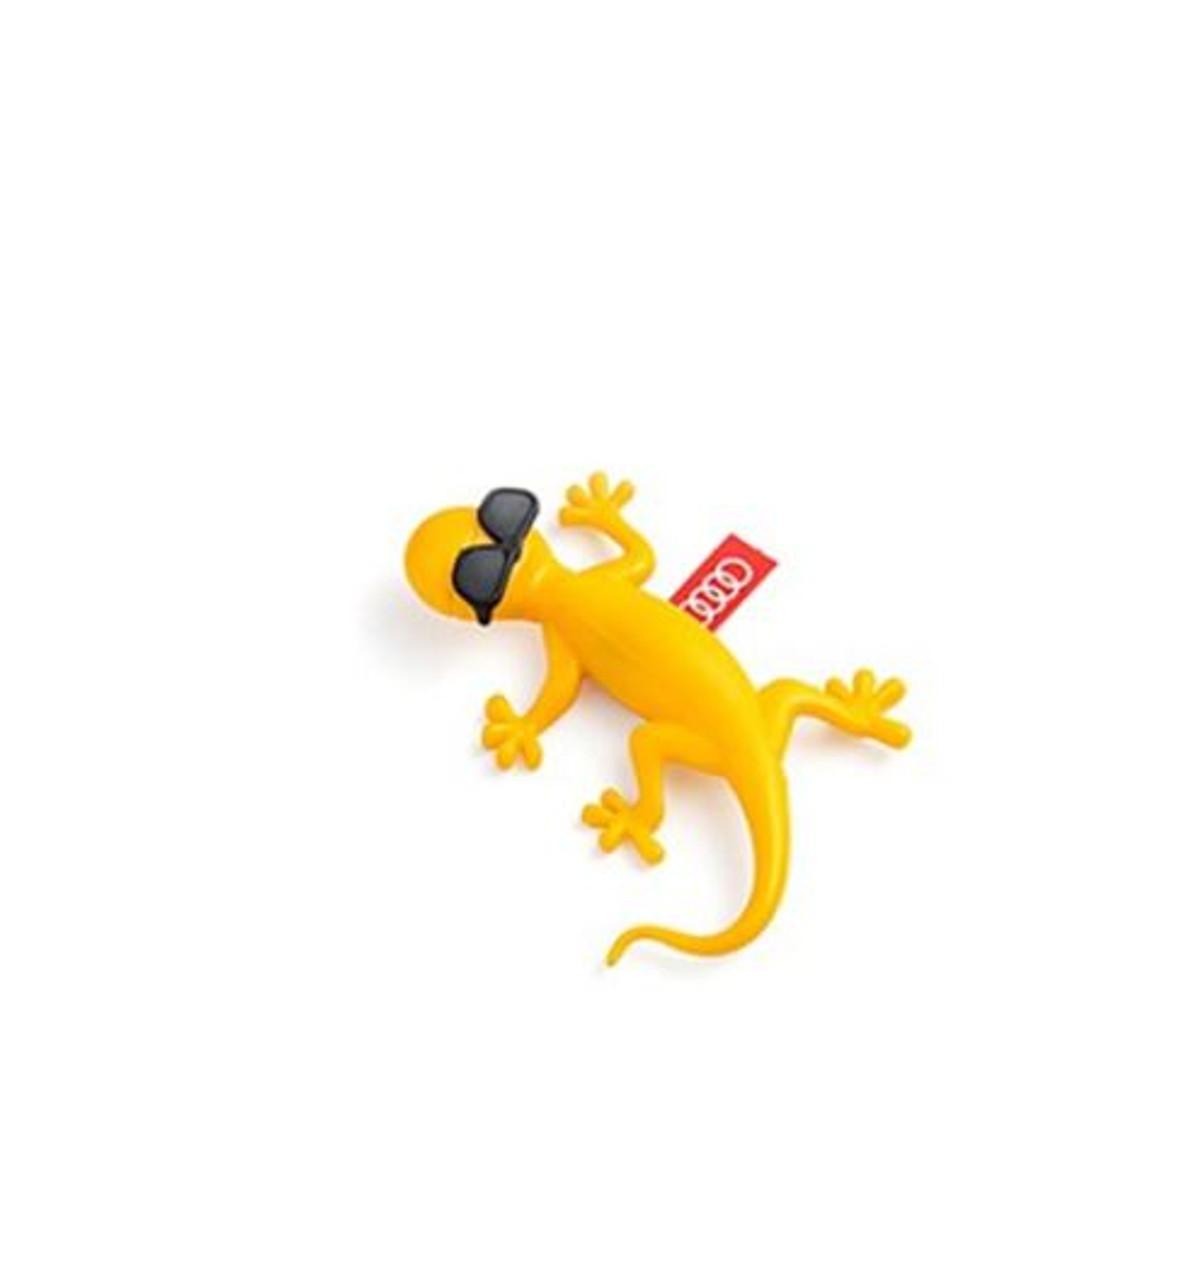 Genuine AUDI Gecko Air Freshener - Yellow/Sunglasses 000087009AR